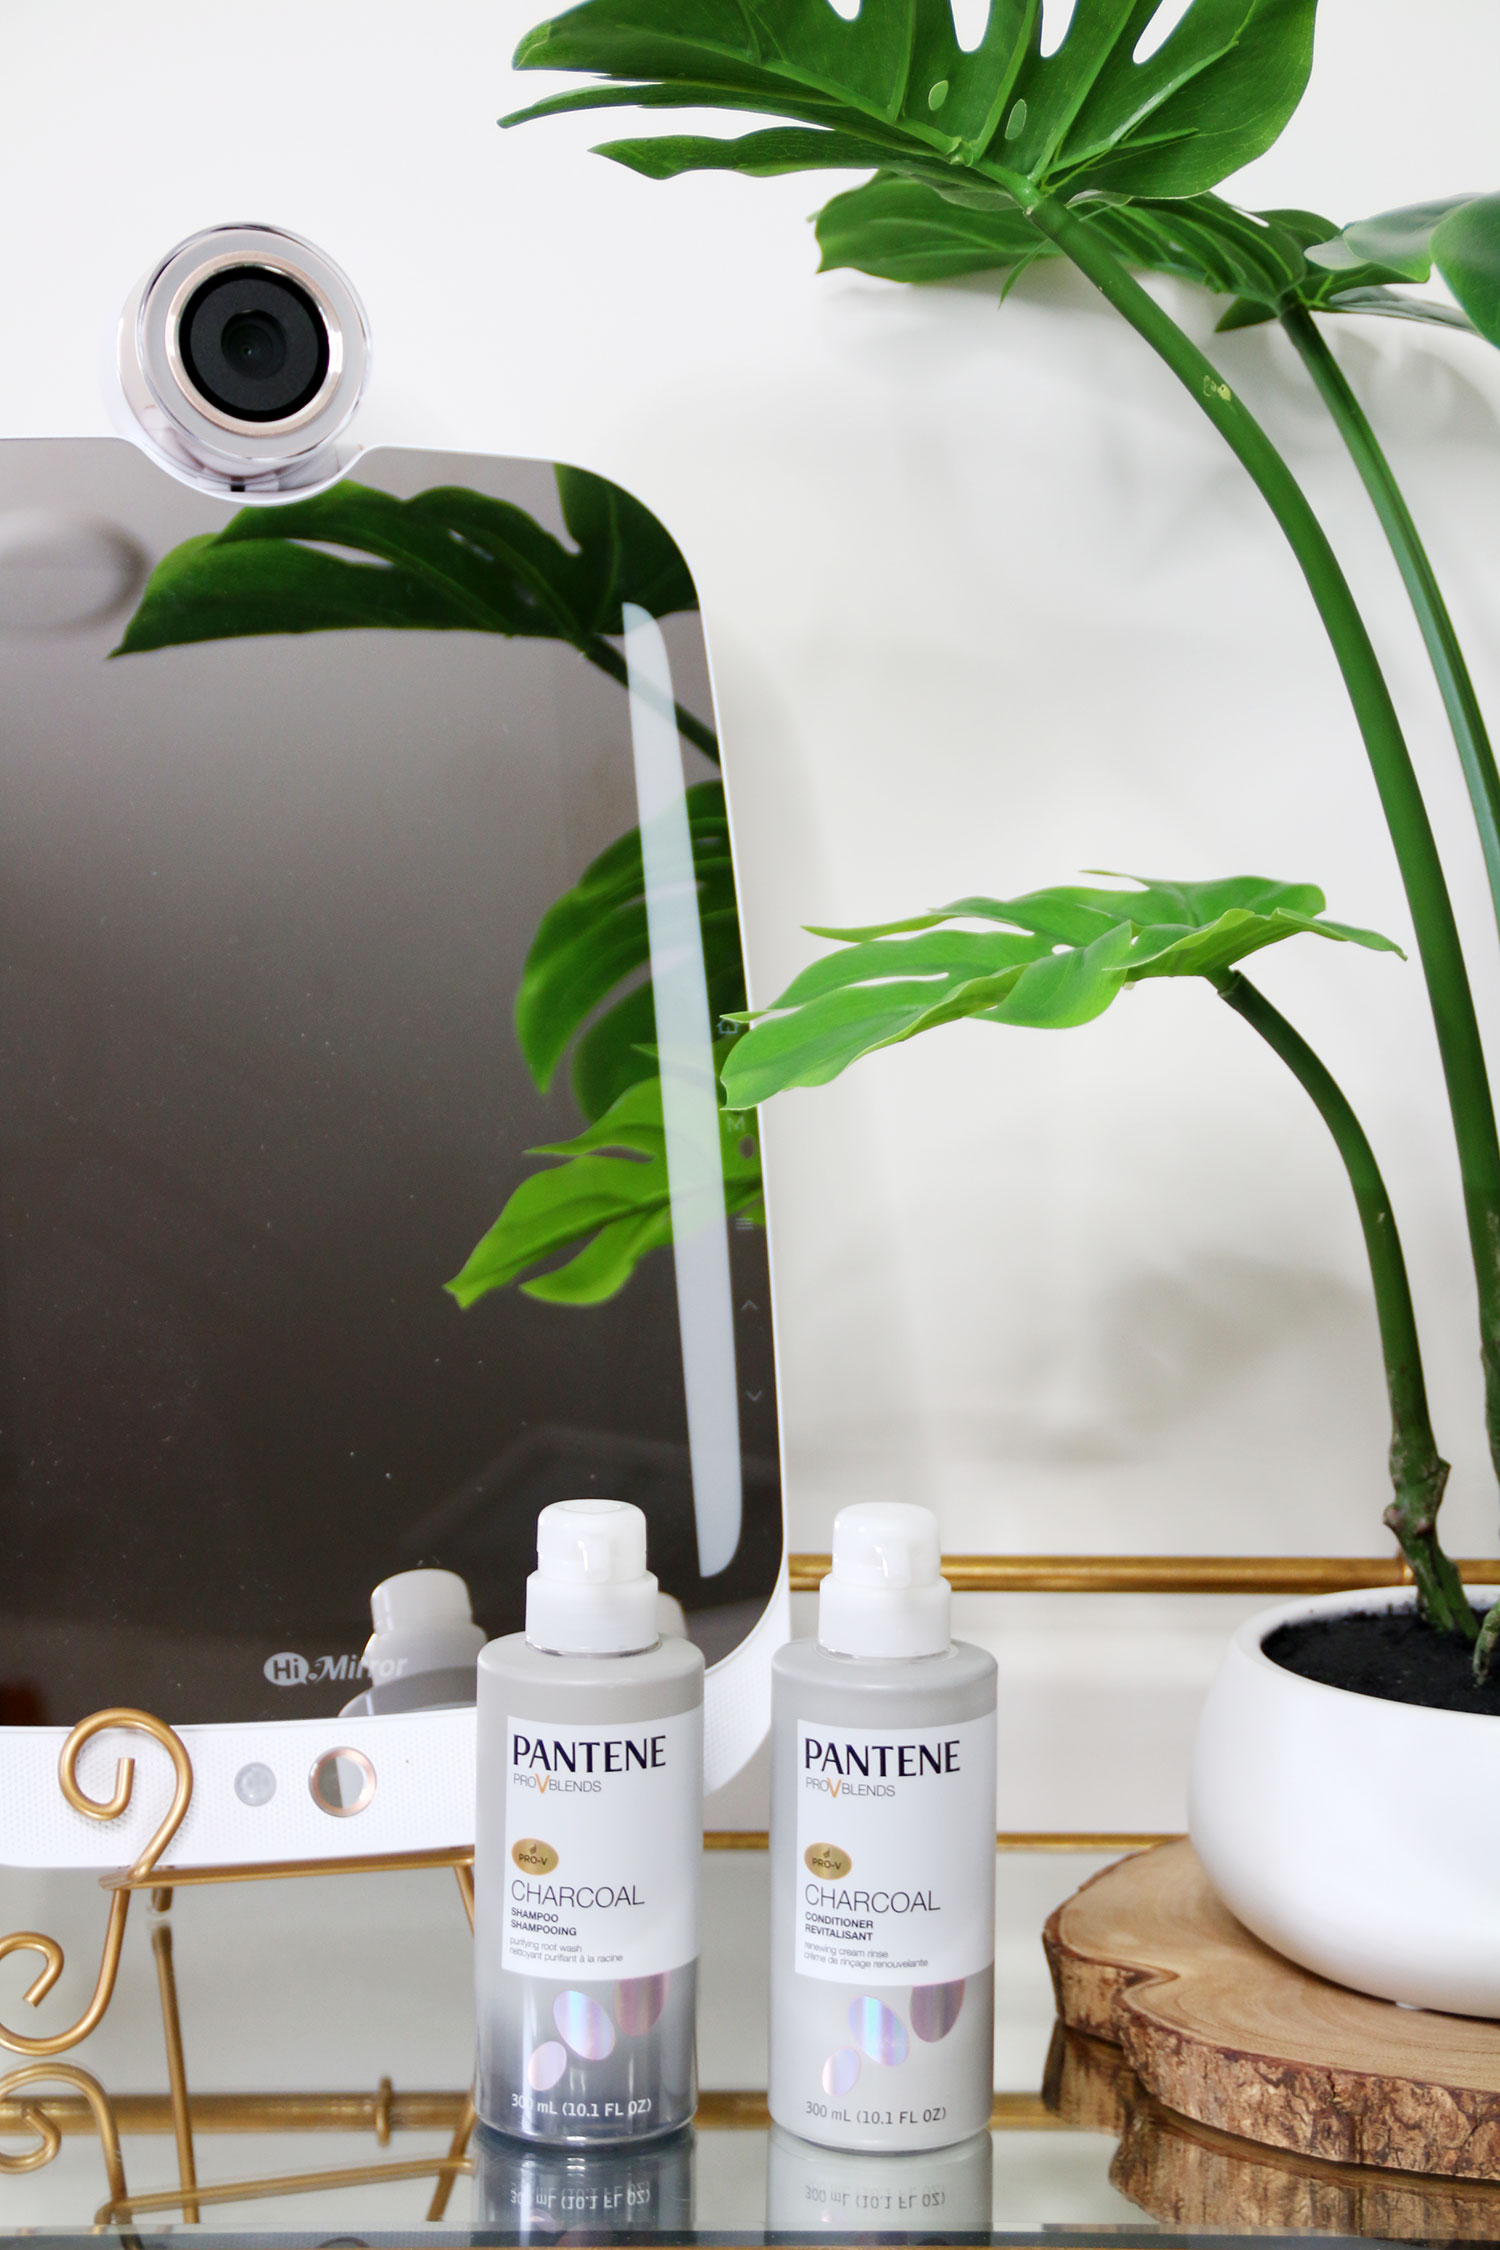 Pantene Pro-V Blends Charcoal Collection